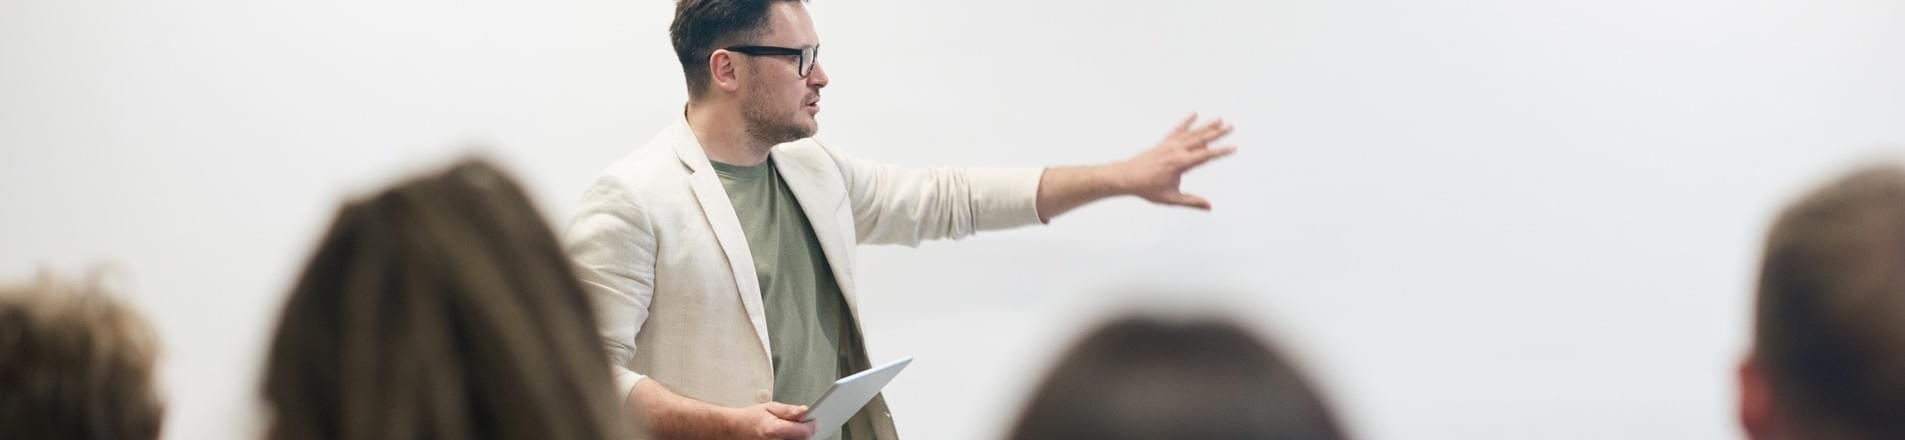 New Zealand Teachers' bias against Maori pupils revealed